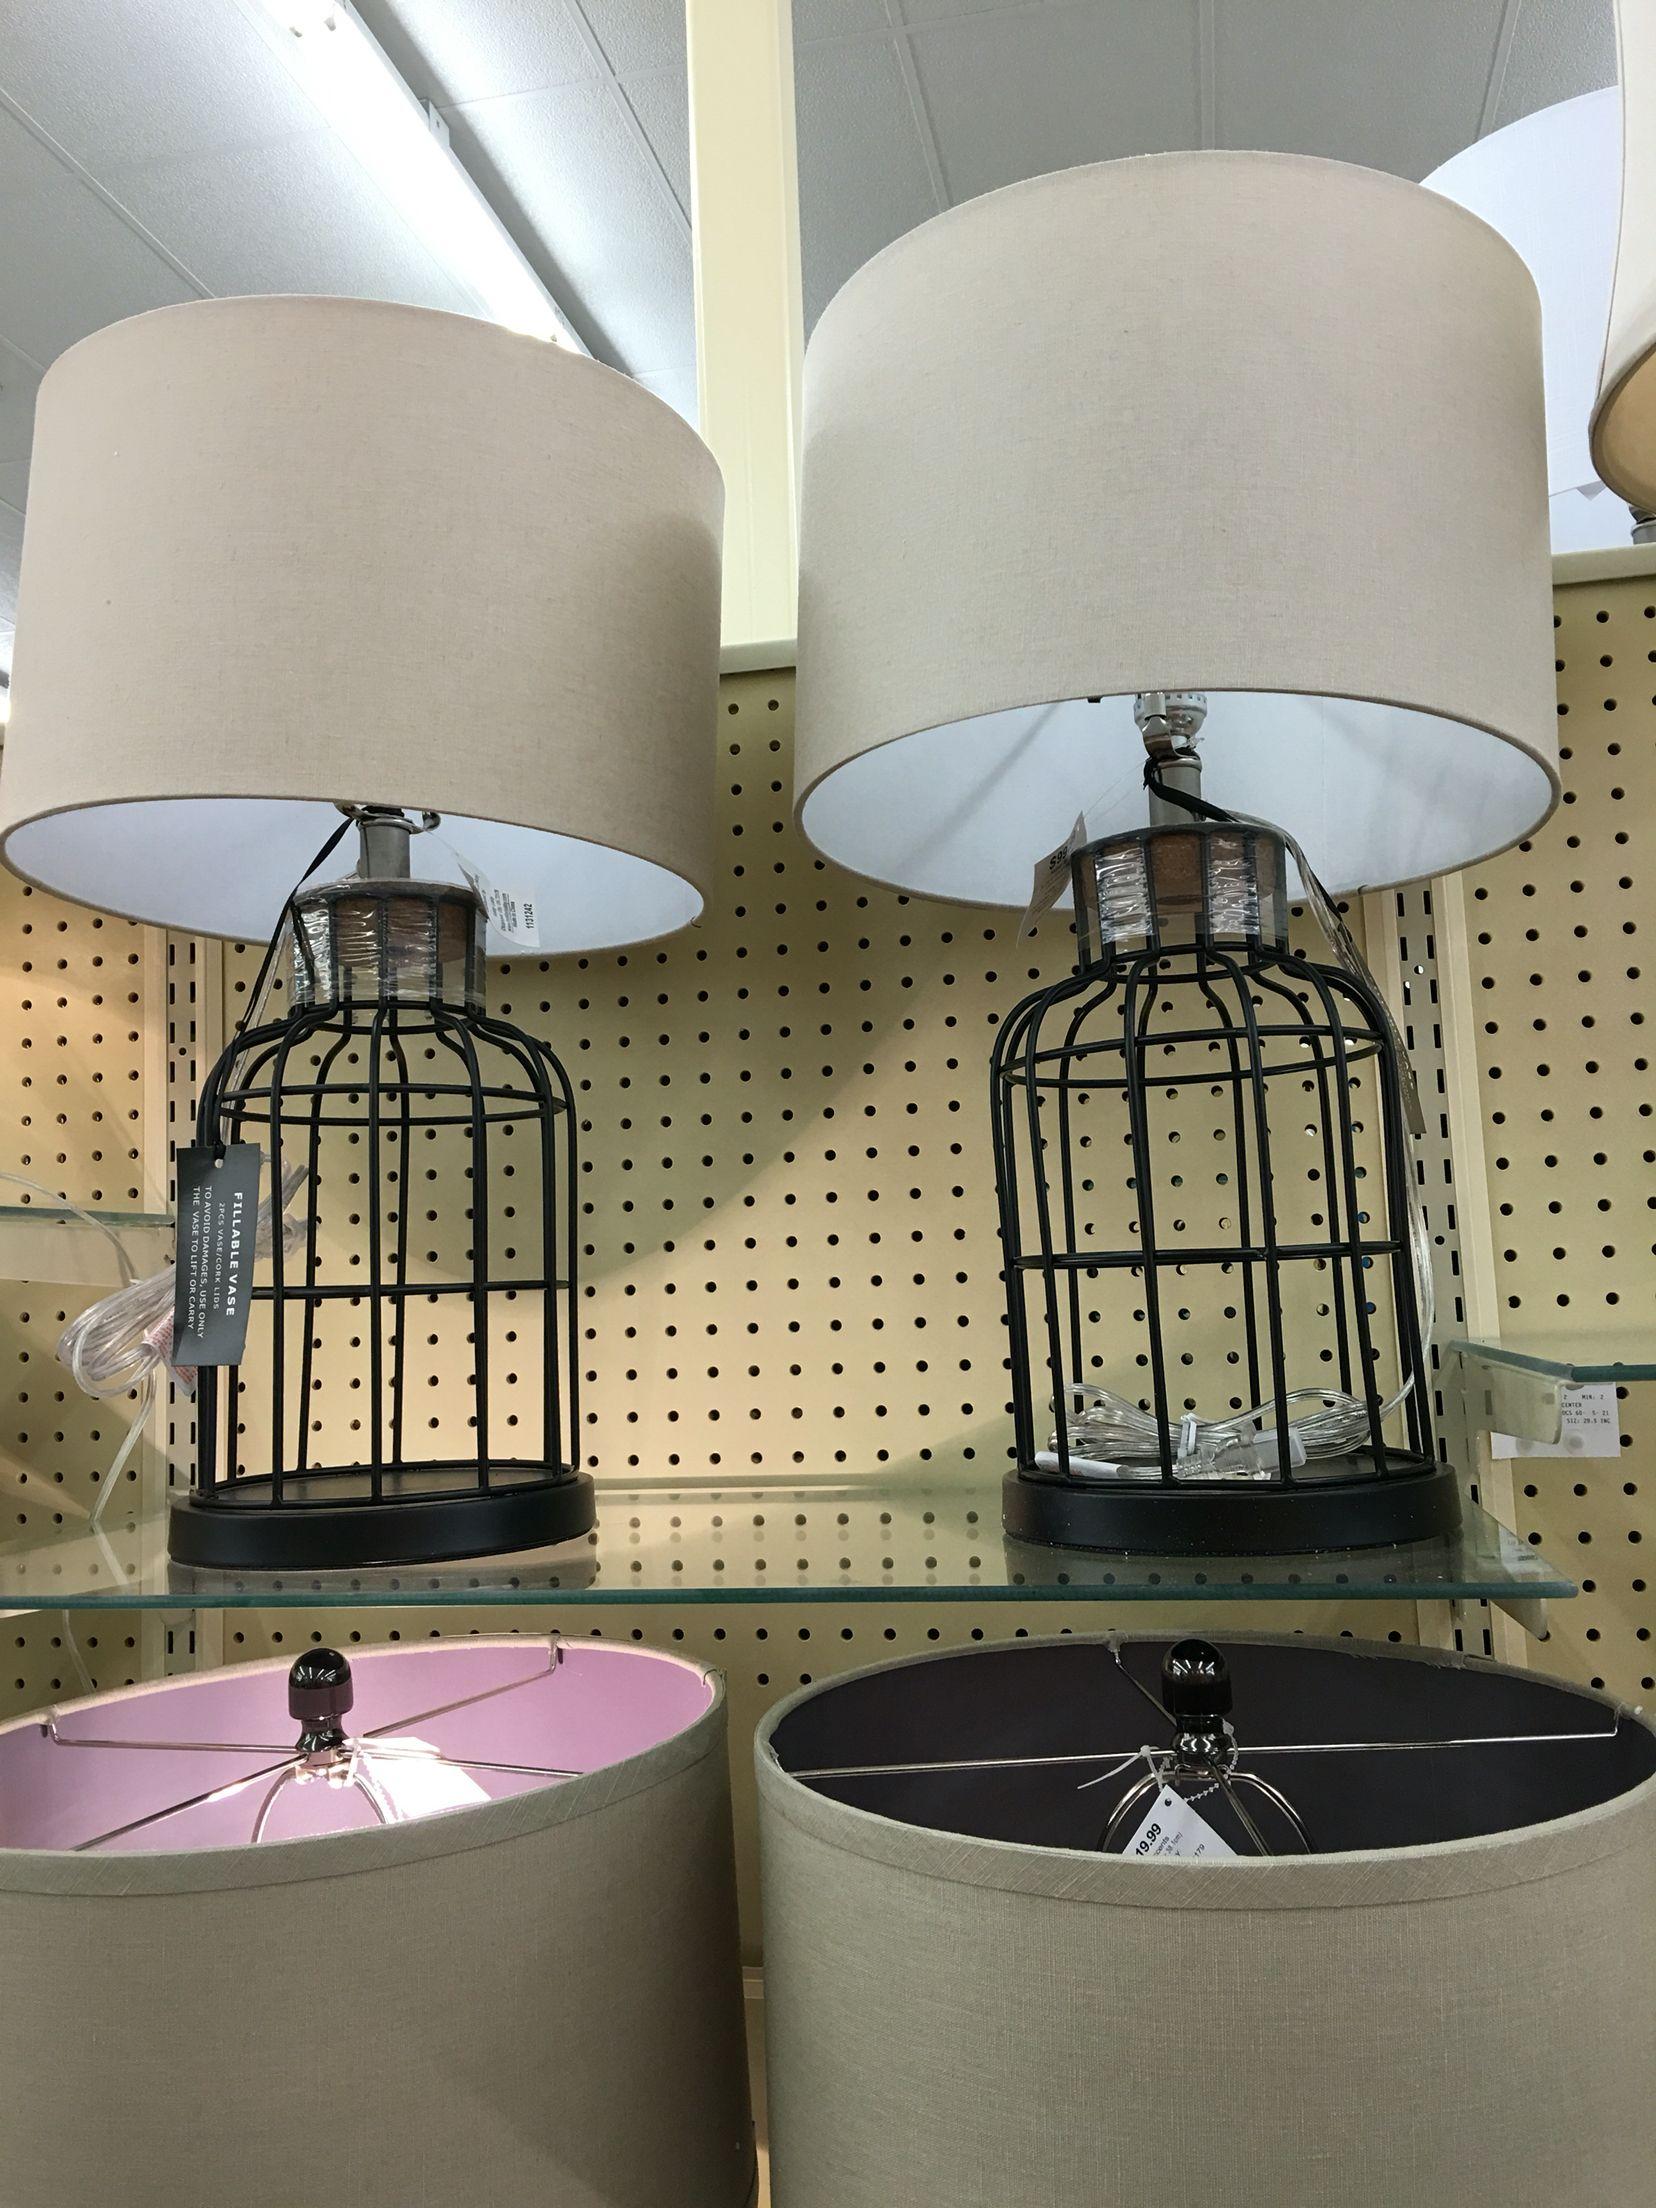 Fillable Lamps Hobby Lobby Fillable Lamp Lamp Light Lamp